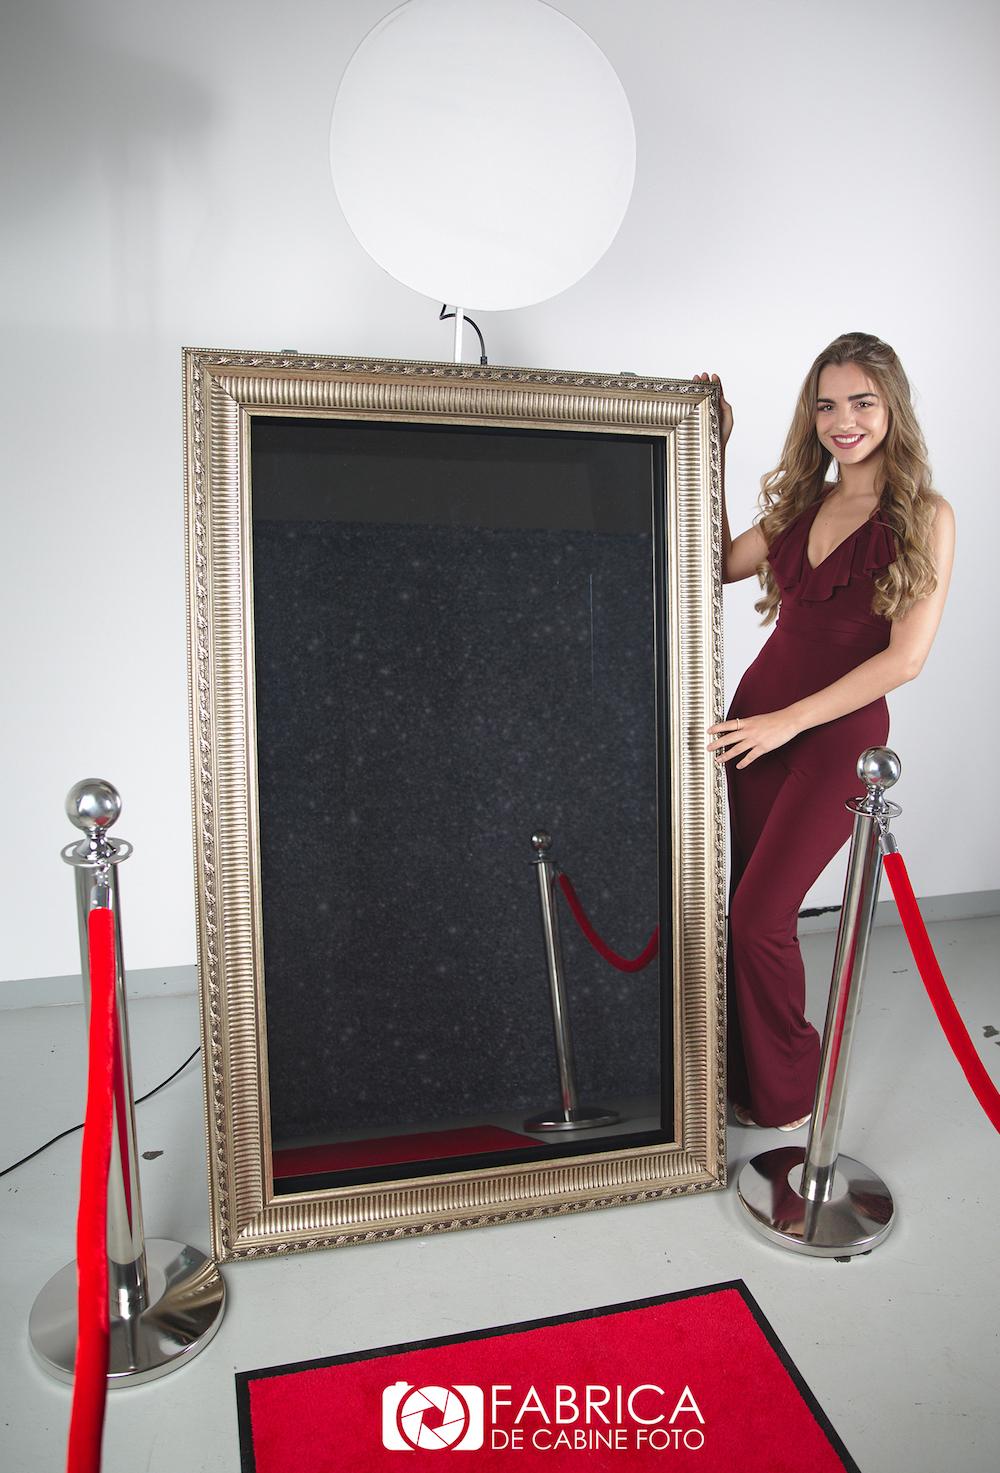 Cabina Oglinda Pro Mirror Photo Booth Pro 5300 Euro